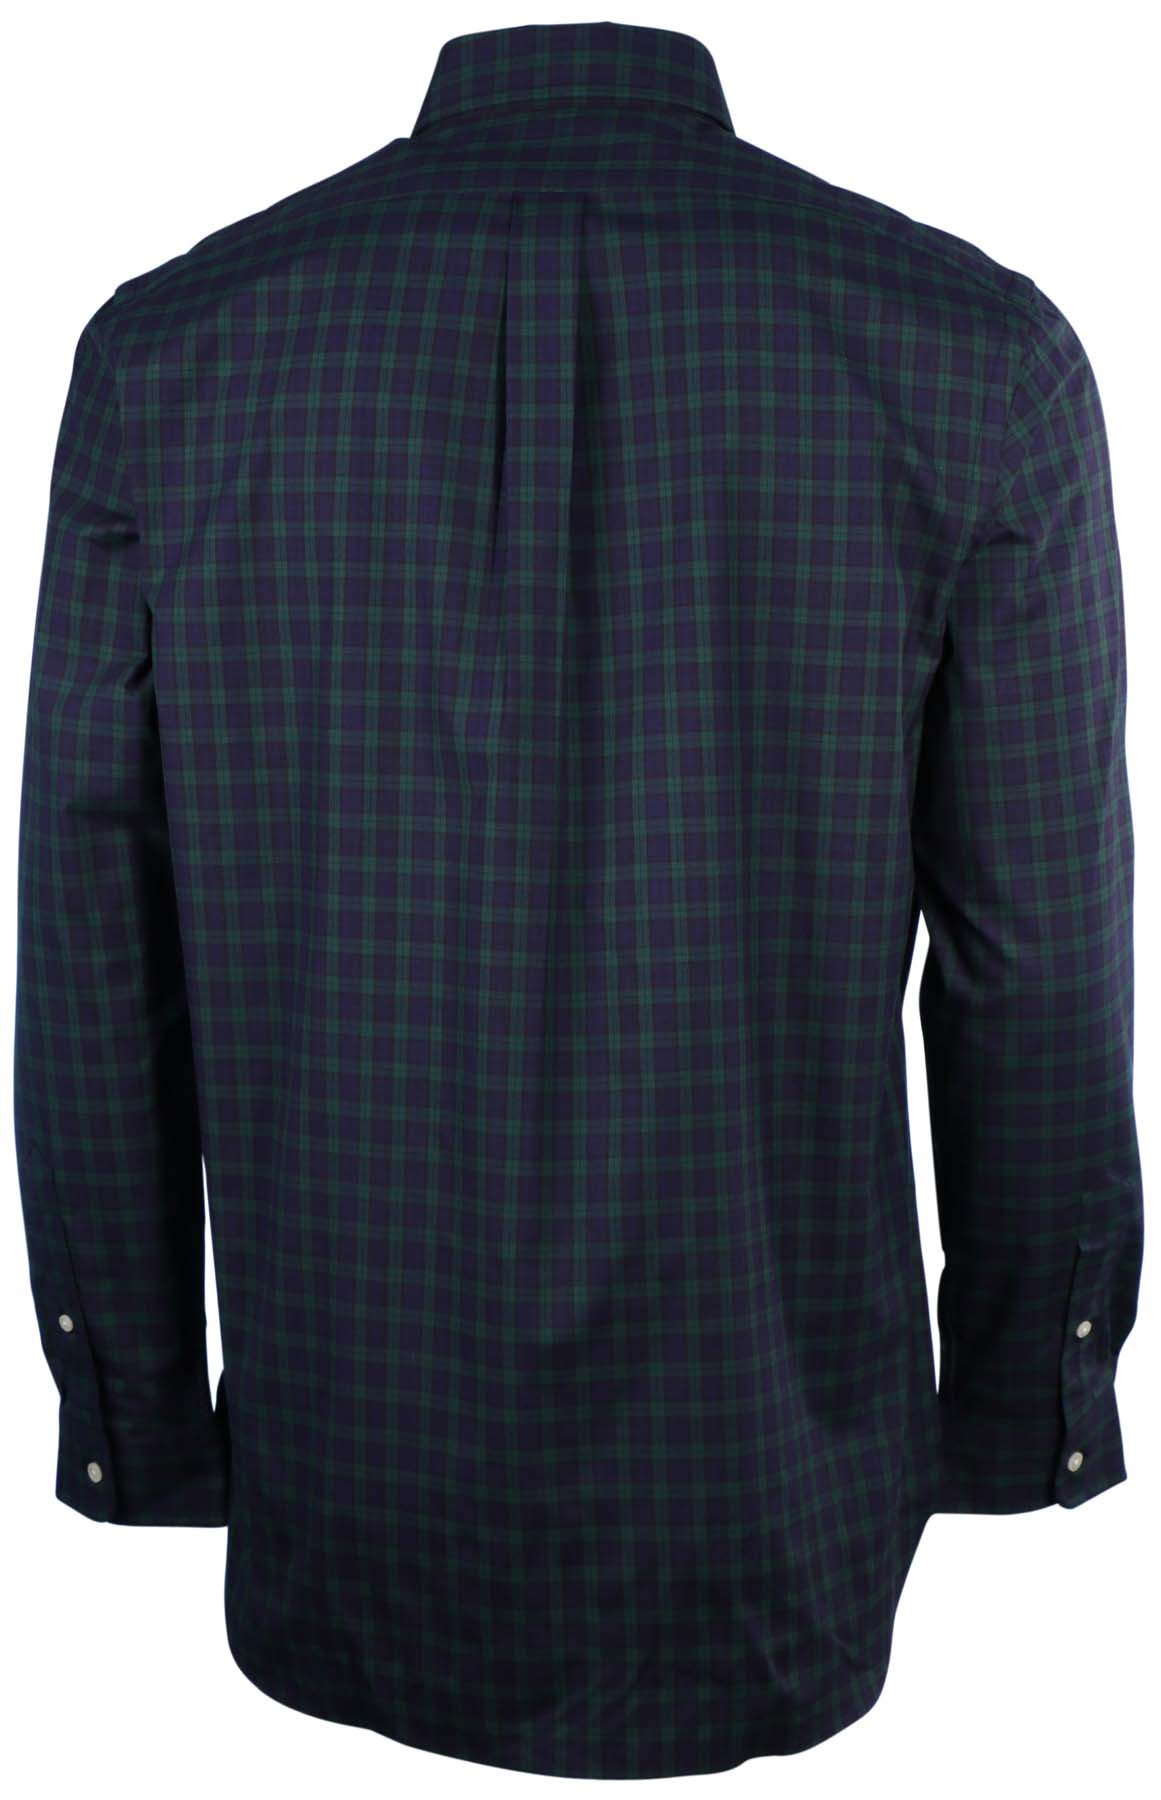 Polo ralph lauren men 39 s plaid tartan button down shirt ebay for Men s down shirt